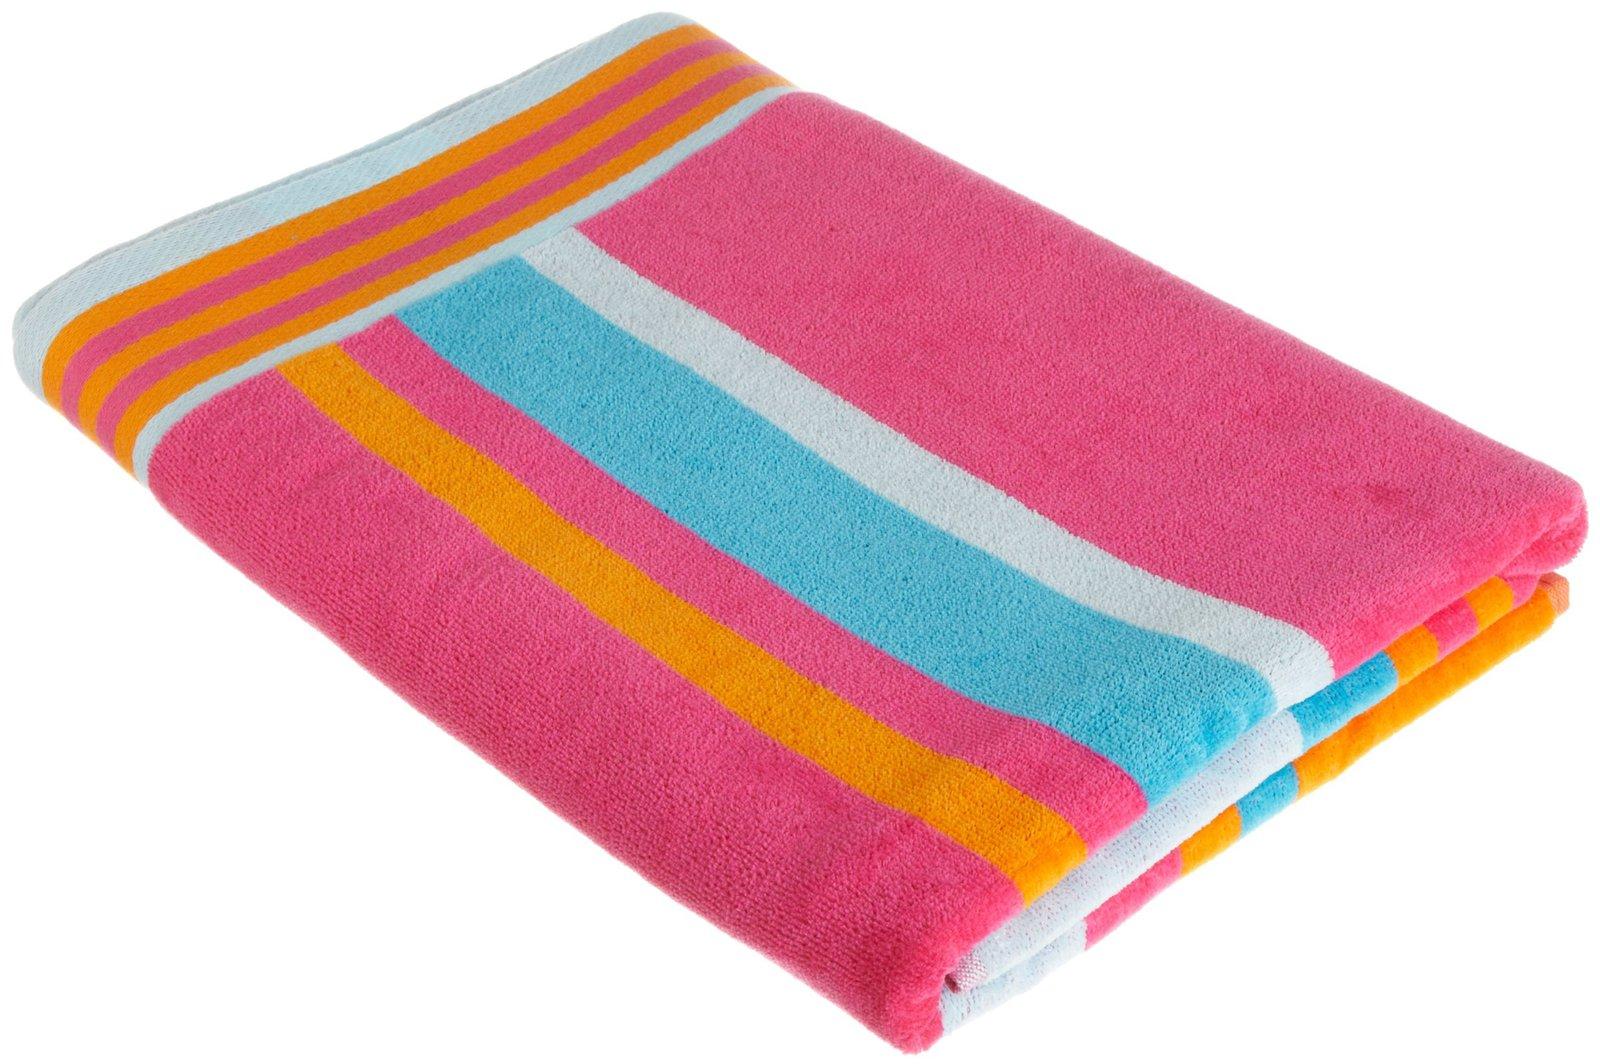 Folded Beach Towel Oversized Beach Towel-Folded Beach Towel Oversized Beach Towel Solid Travel Beach Towel New-11